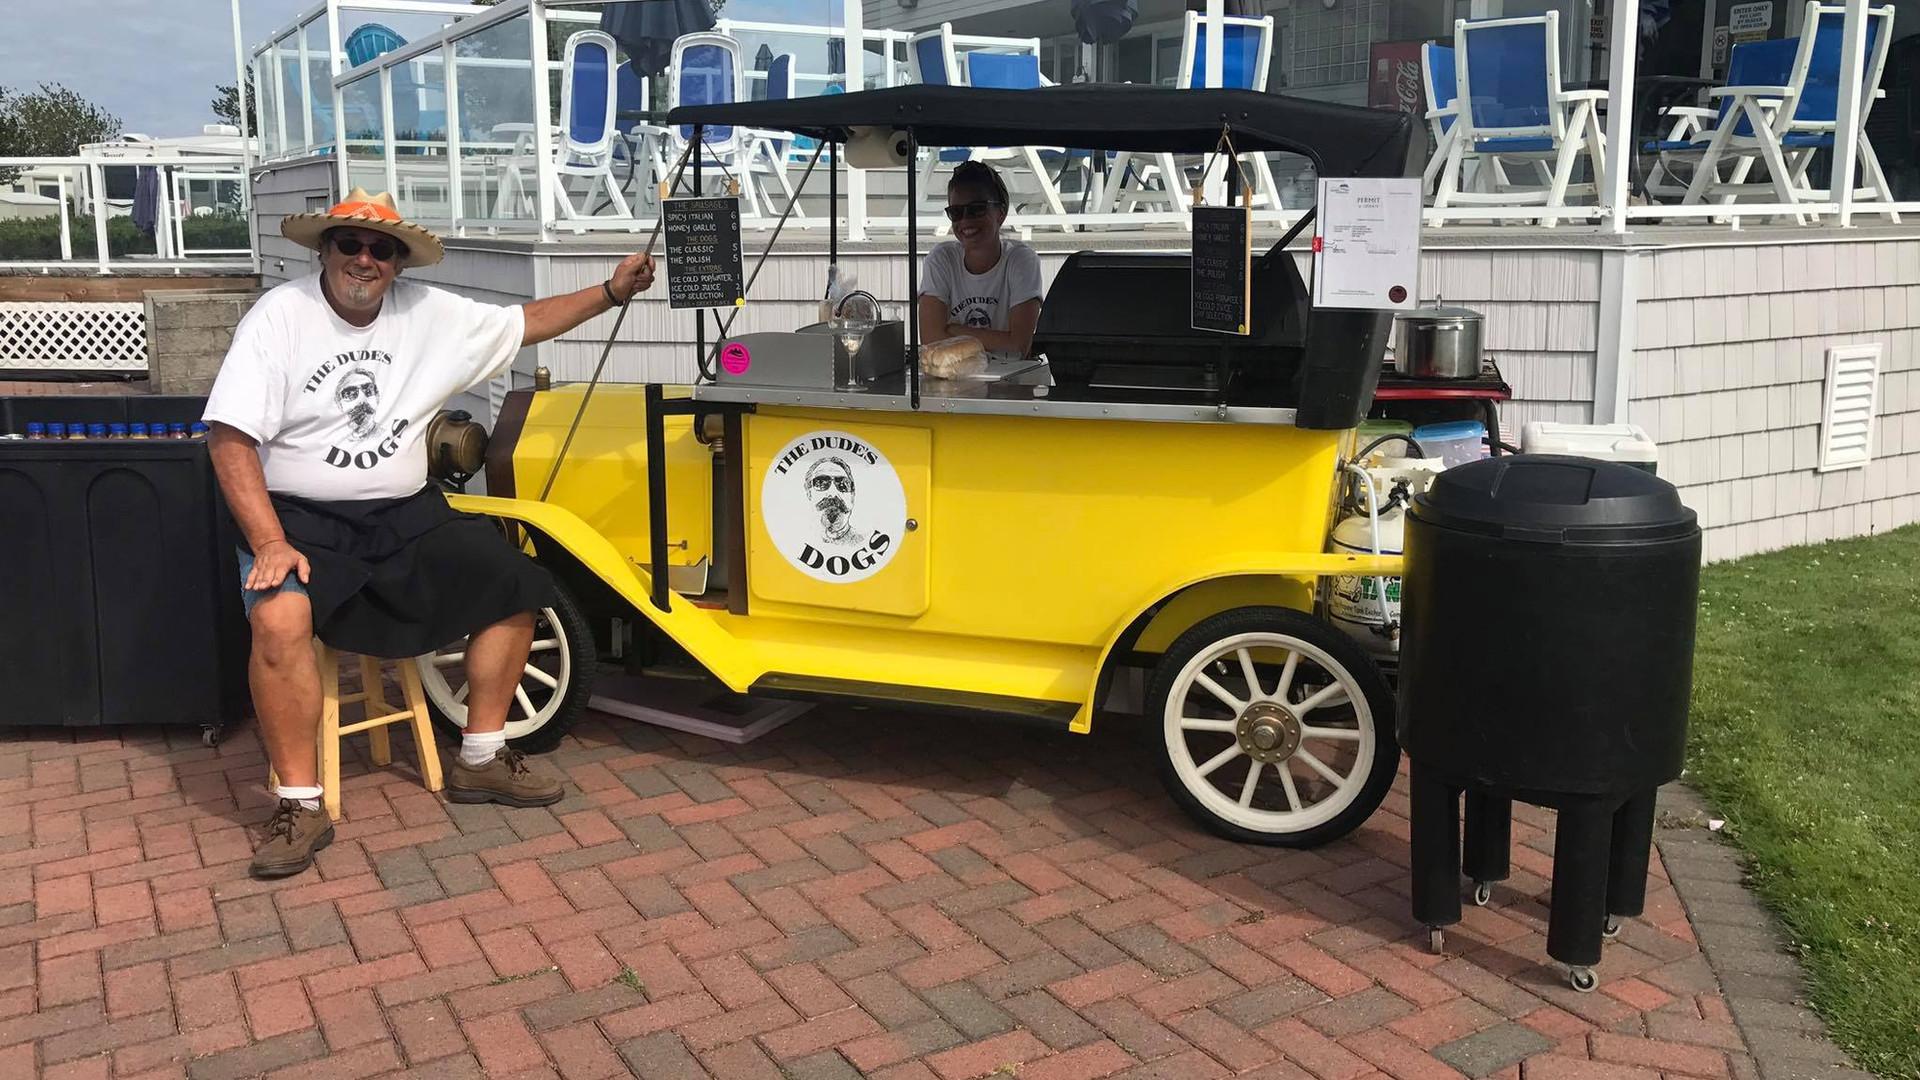 hotdog_cart_Surfside.jpg